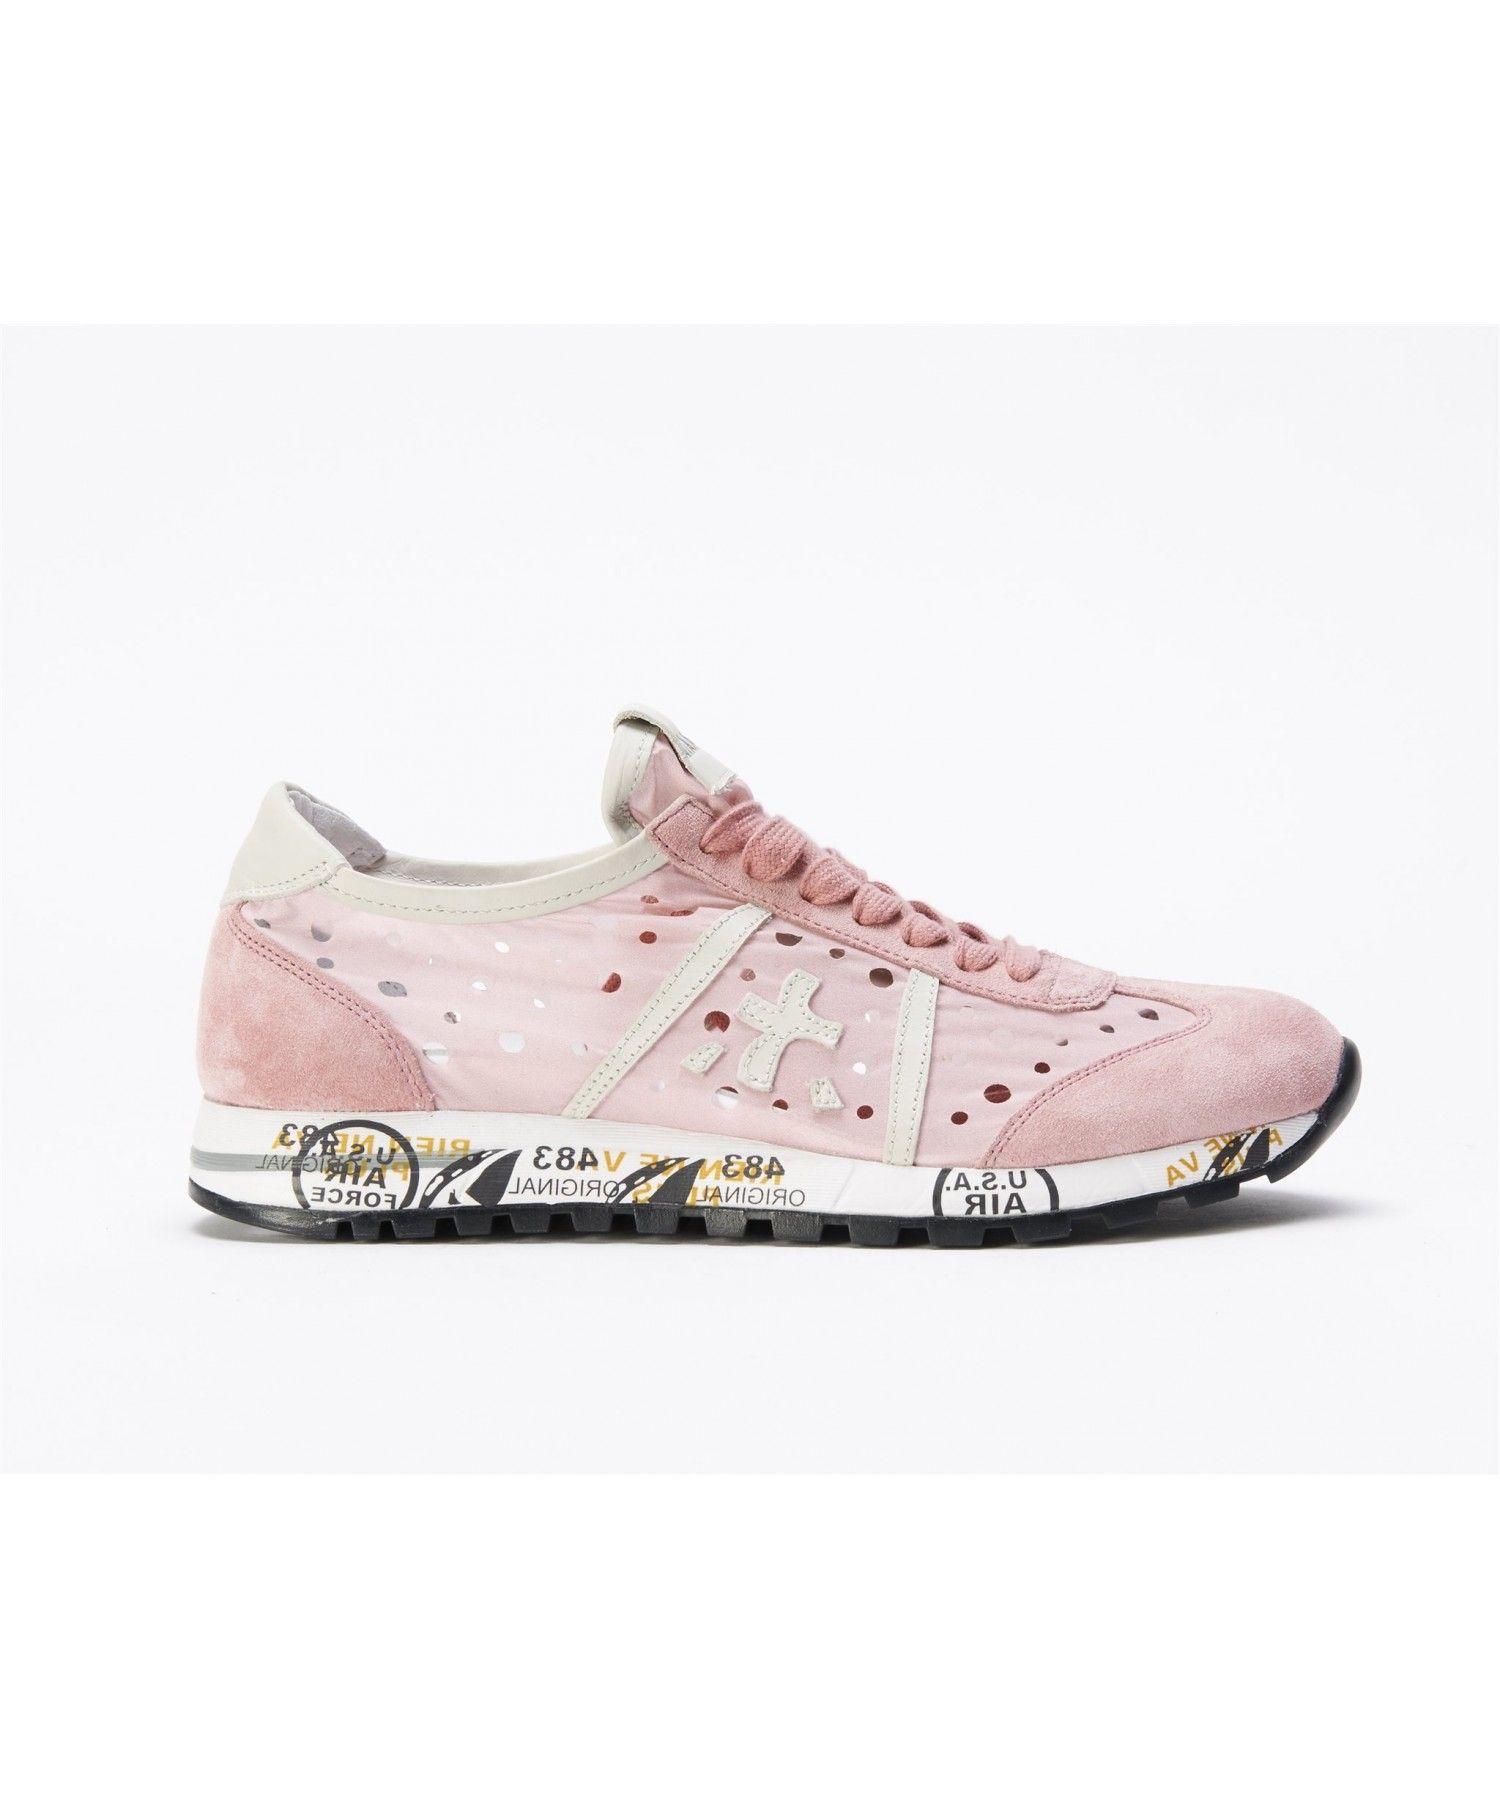 Chaussures Premiata Lucy BKWUYs5B